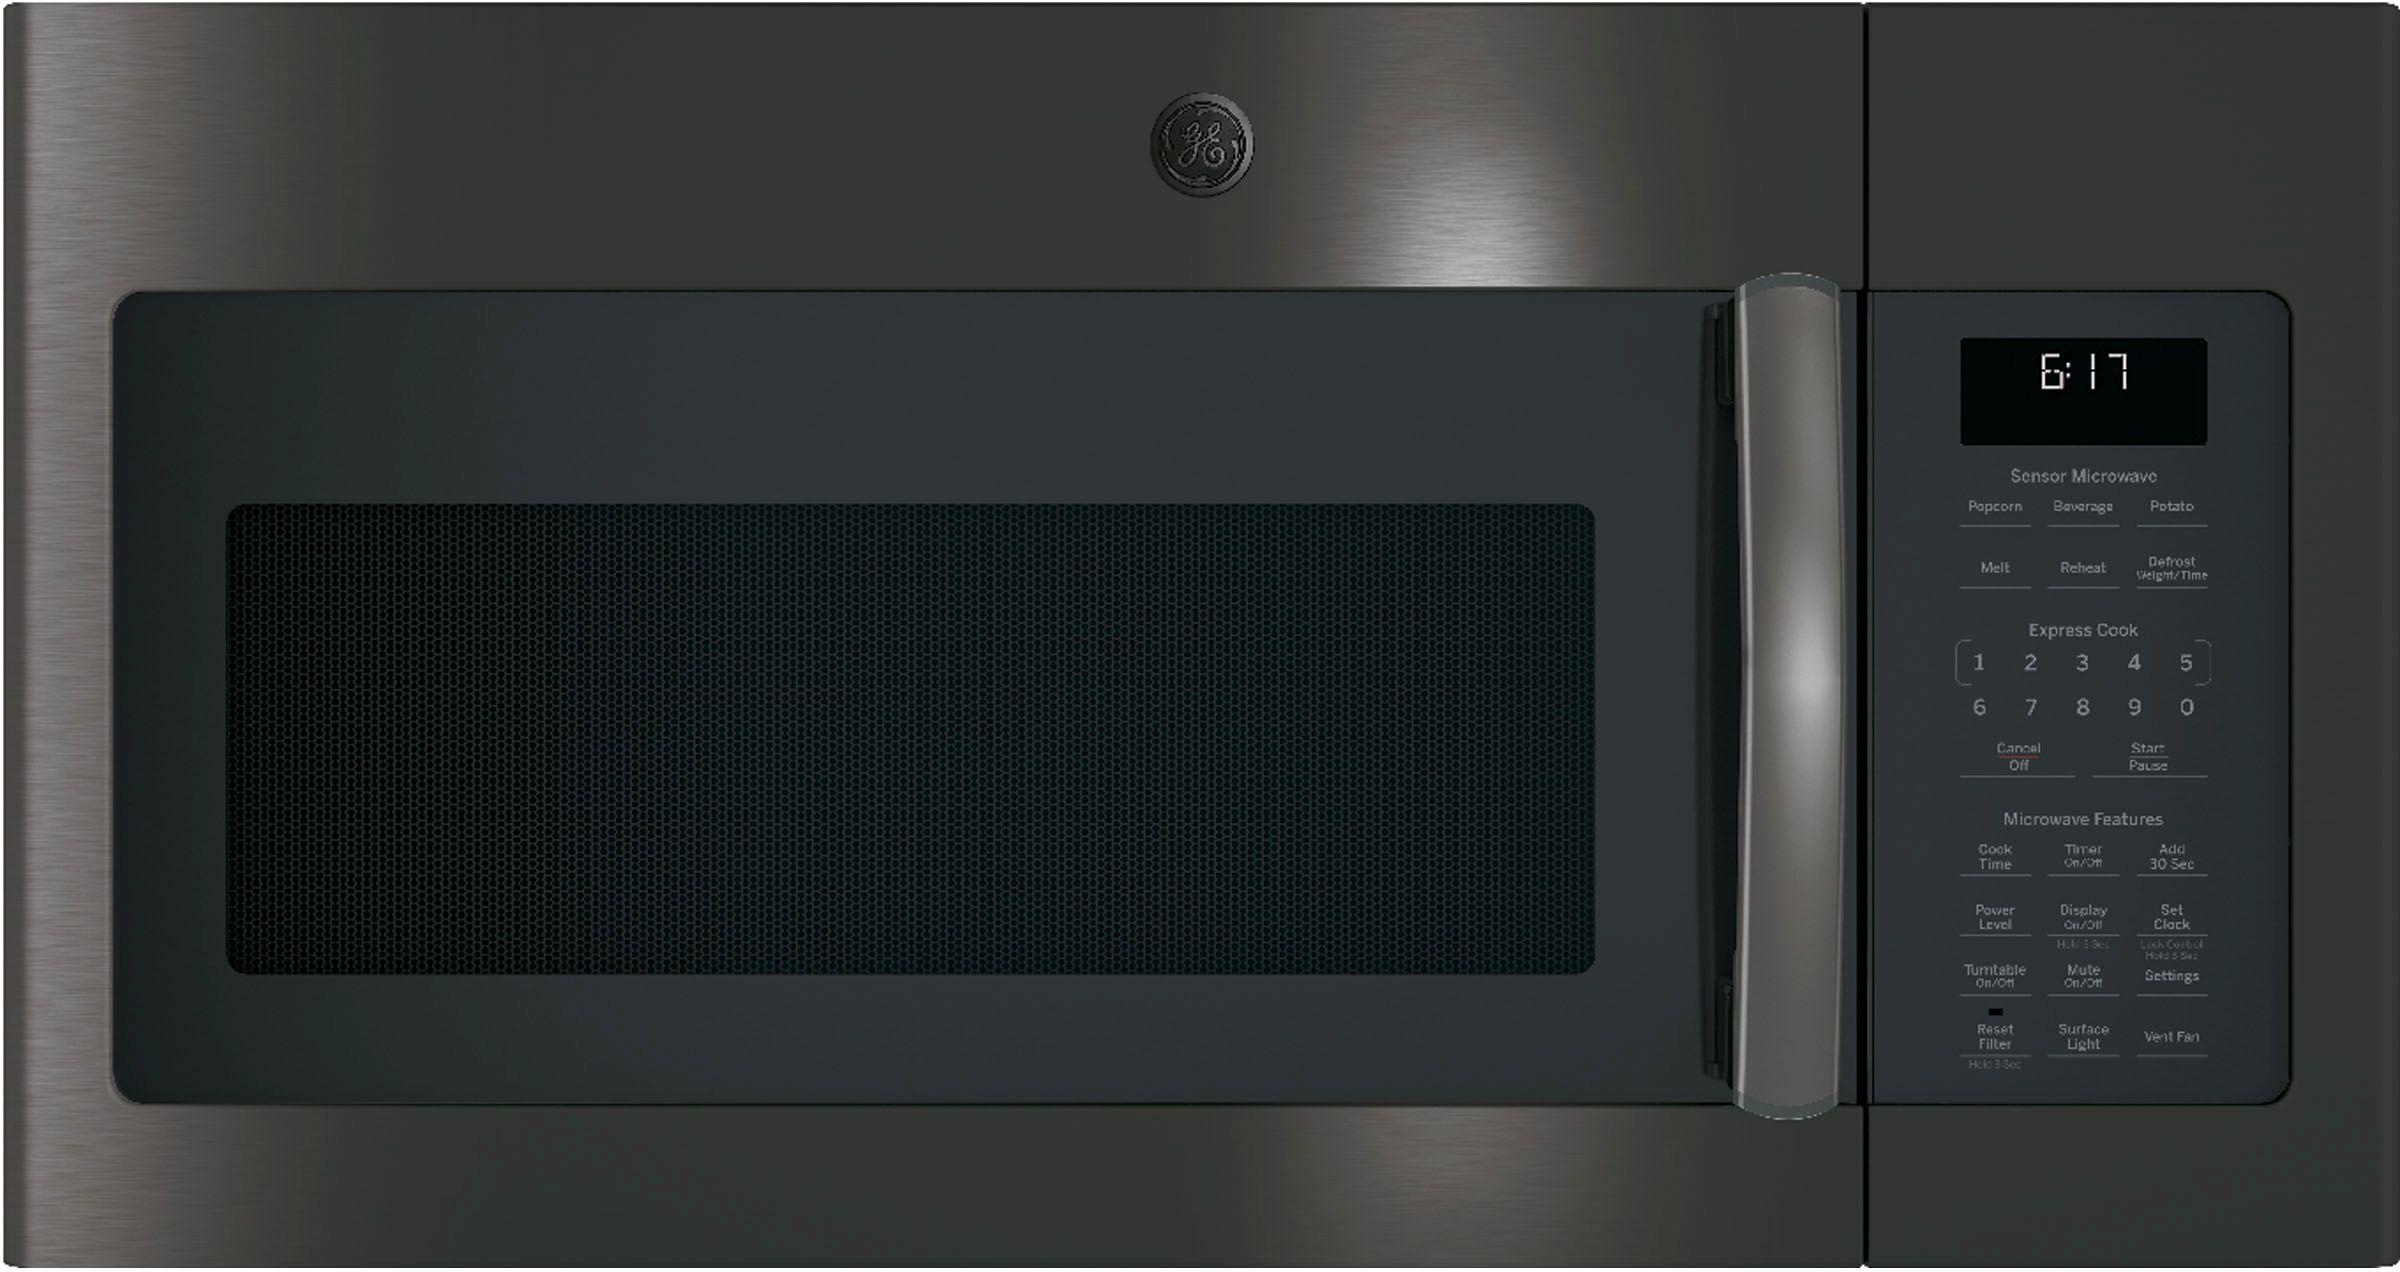 Ge Over The Range Sensor Microwave Oven Black Stainless Steel Jvm6175blts